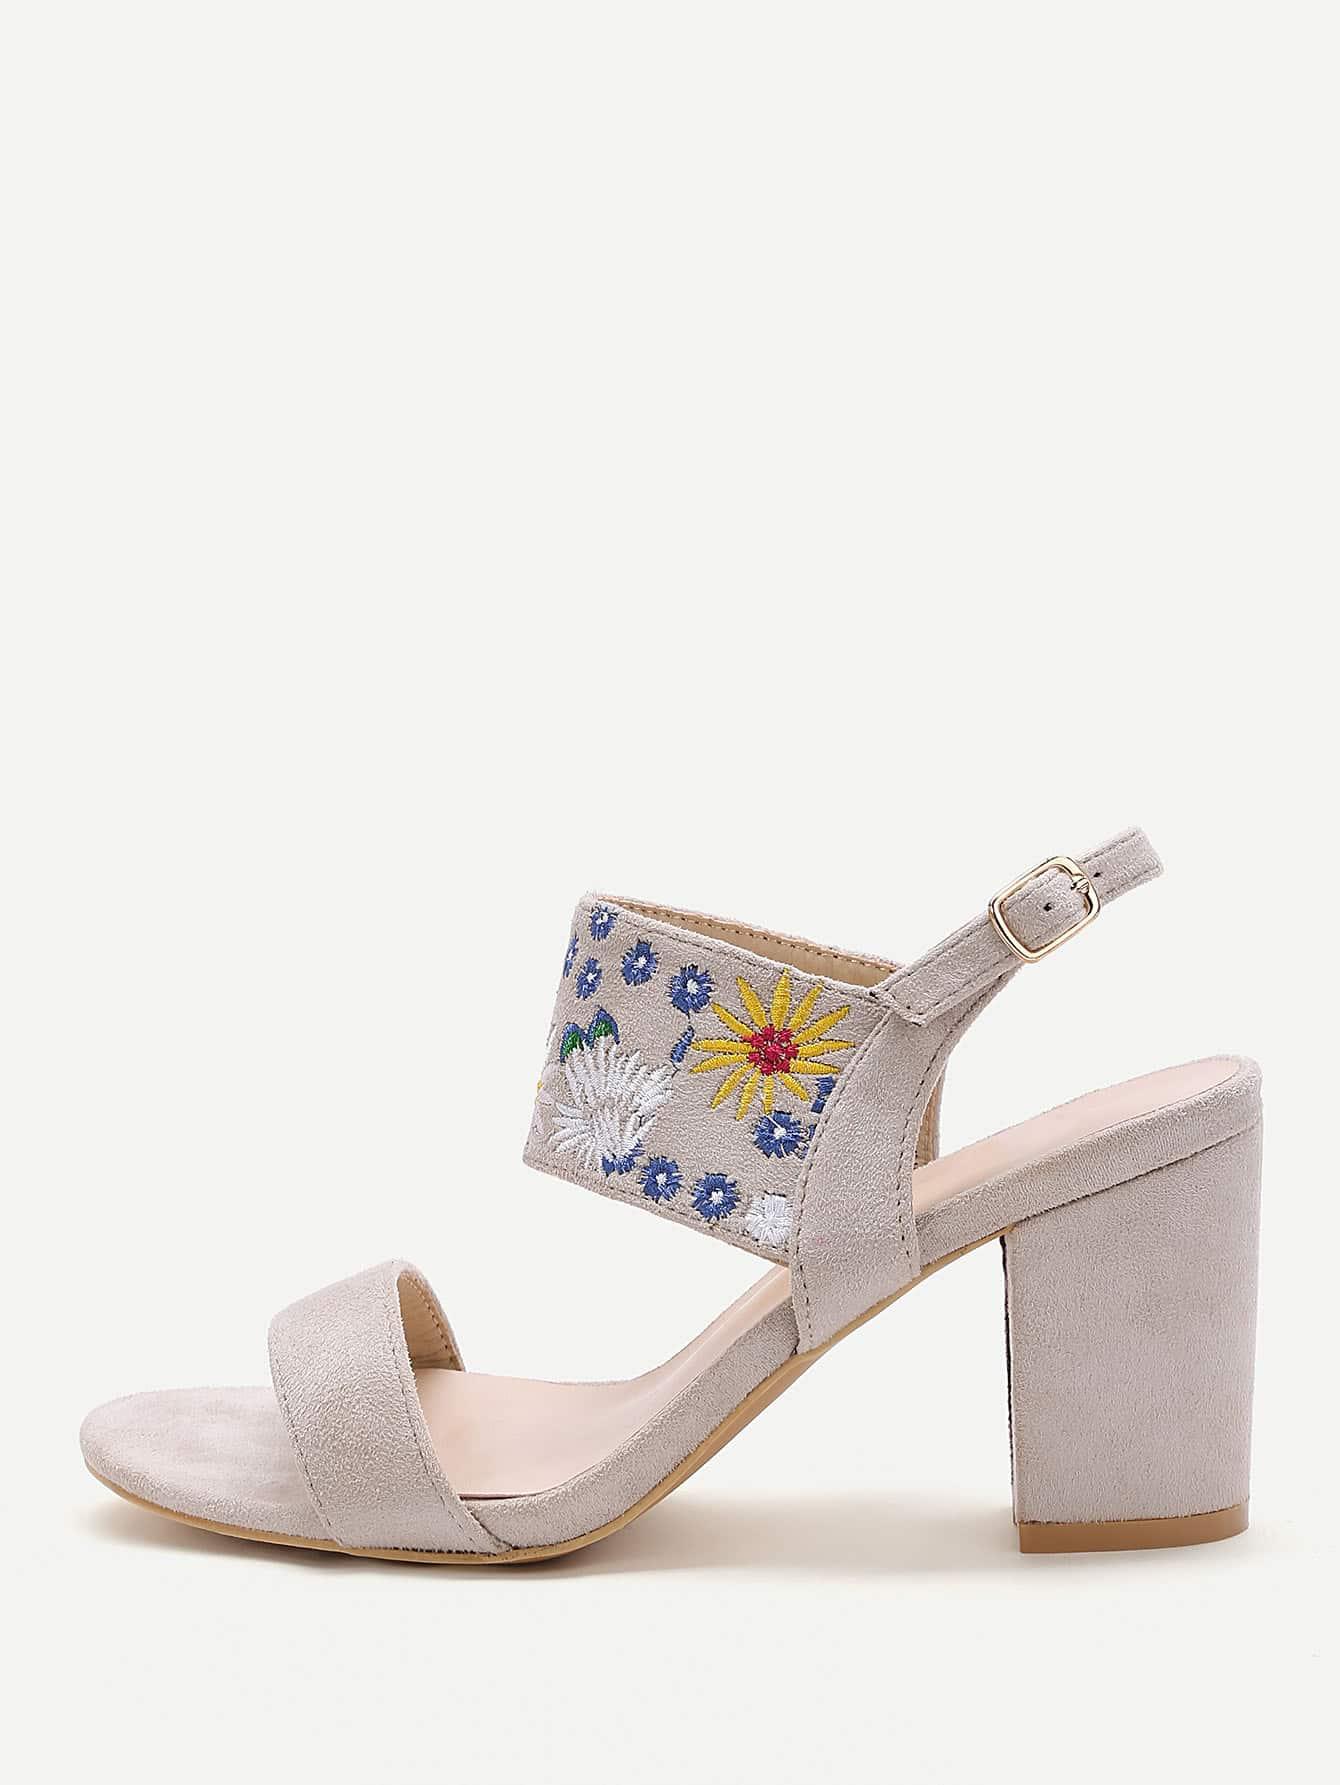 Фото Beige Embroidery Strap Chunky Heeled Sandals. Купить с доставкой